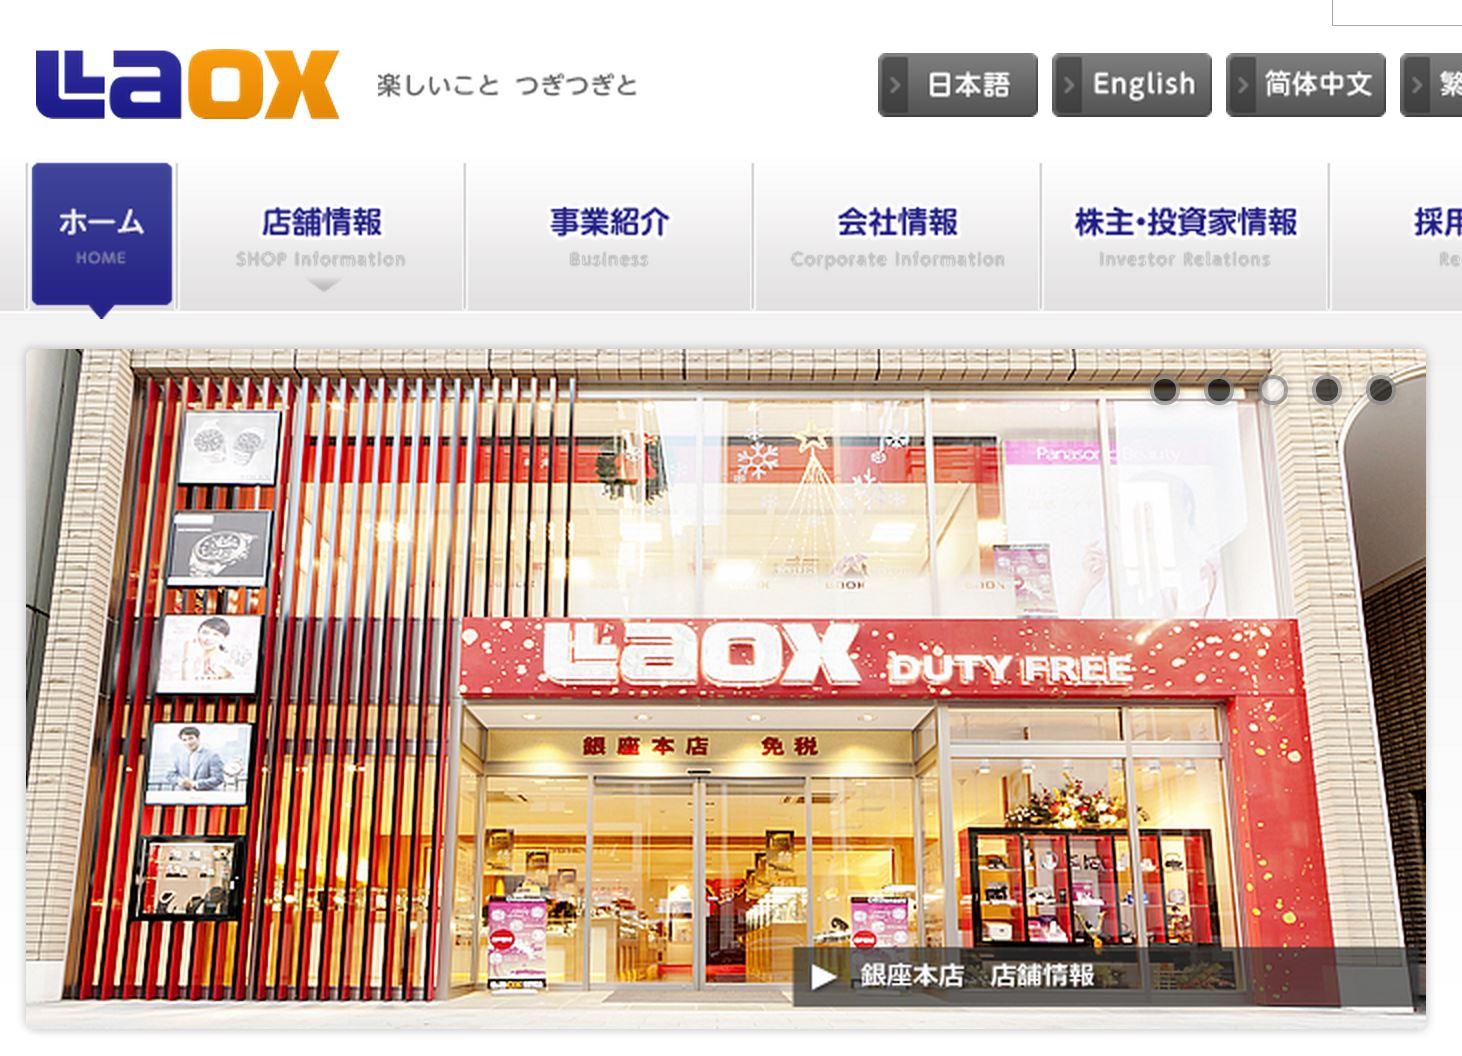 NTTドコモとラオックス、訪日外国人向けに買い物割引サービス、提携国際ローミング利用で